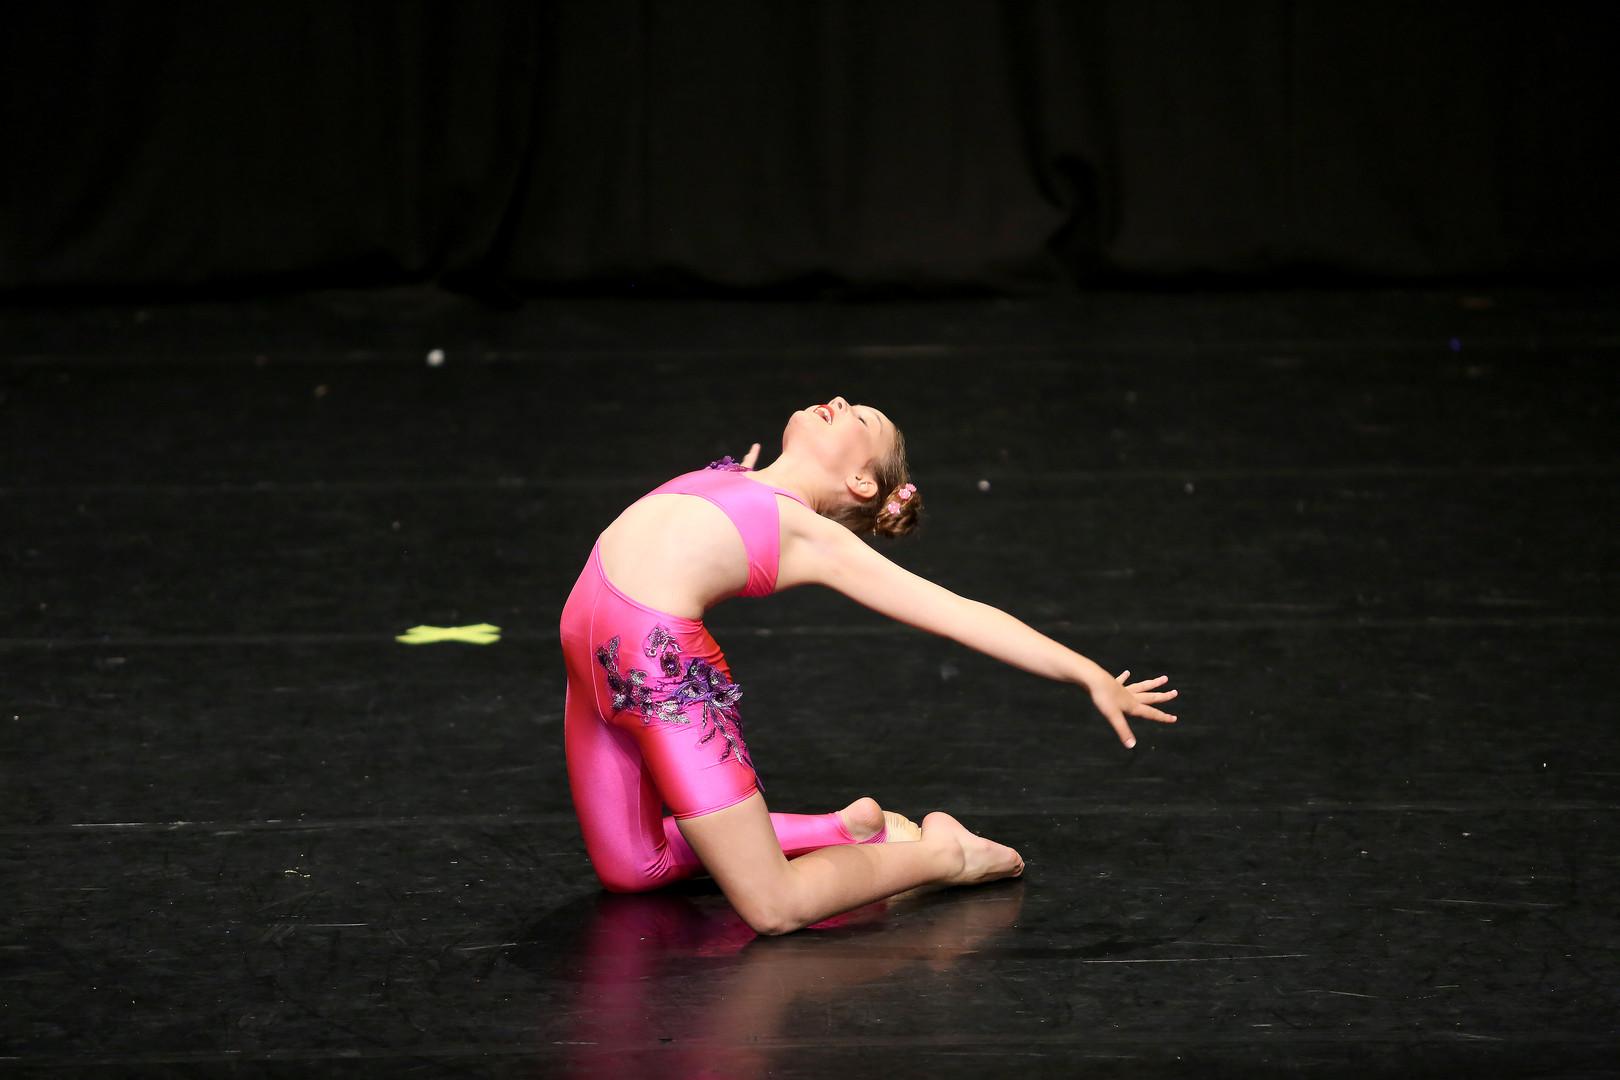 Imogen, Age 11